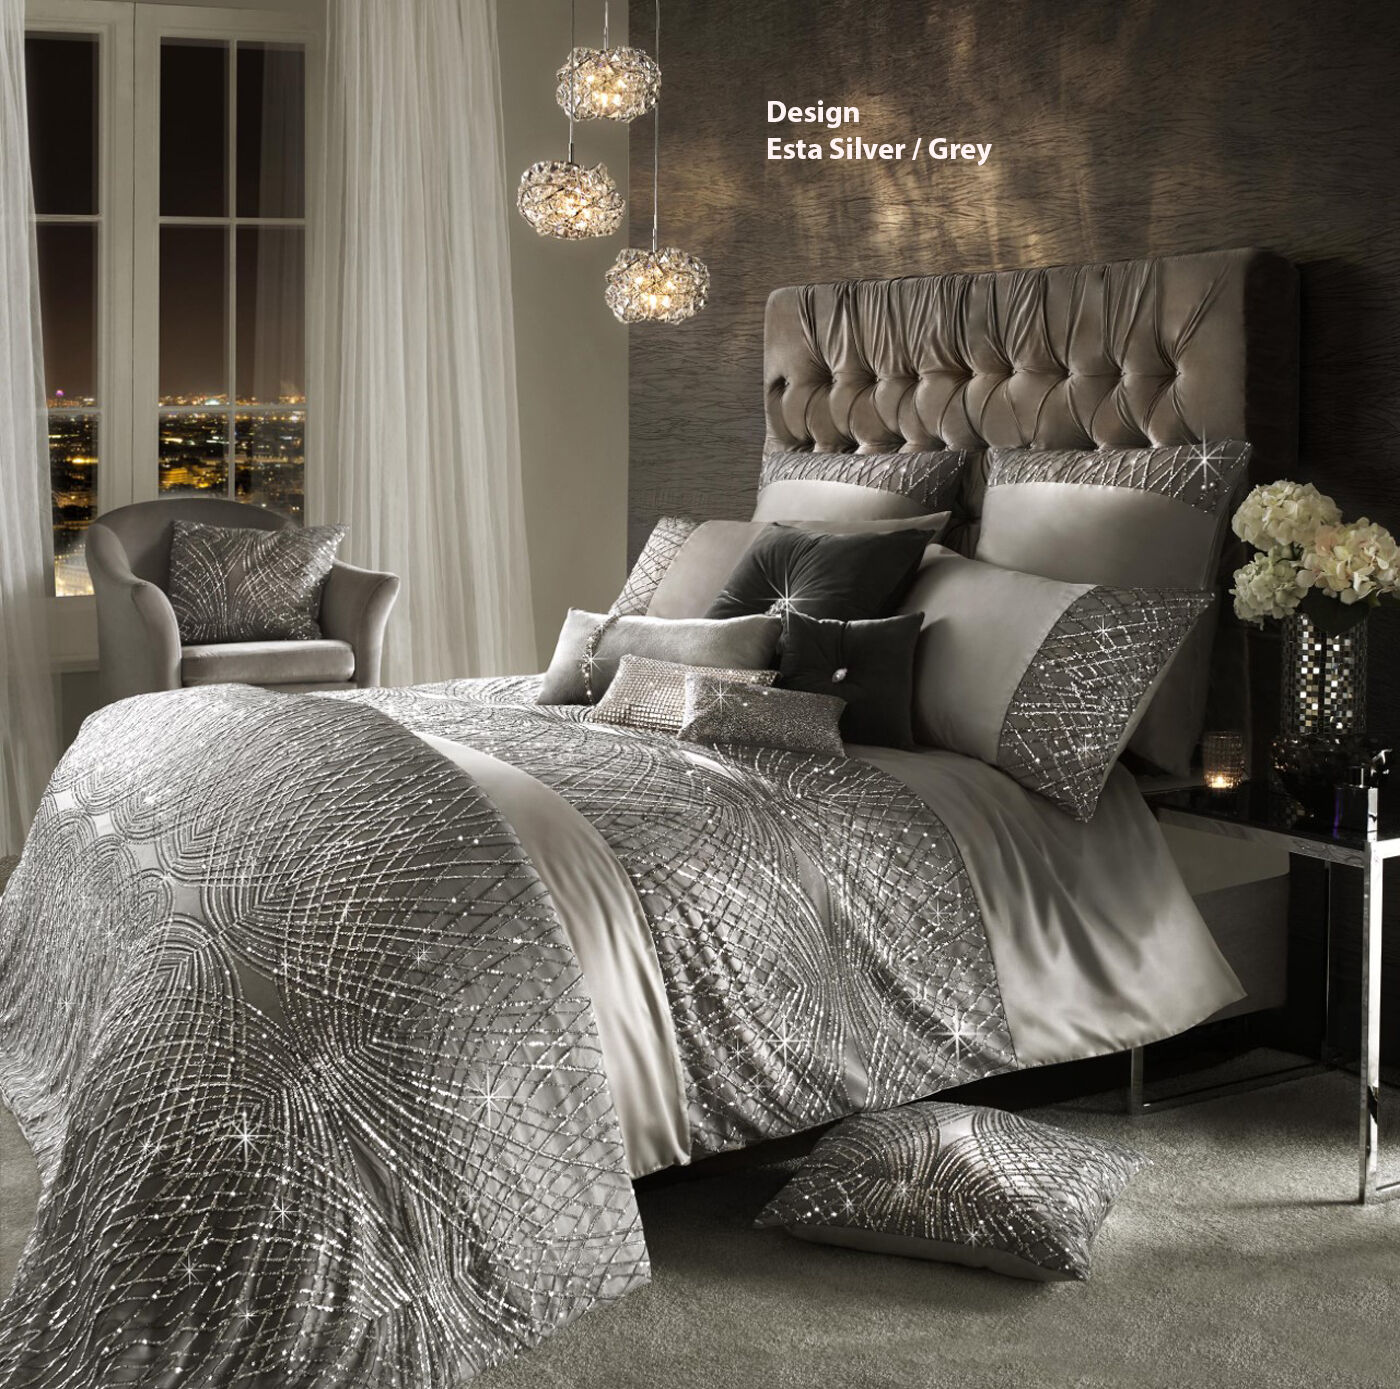 bed piece online luxurious amherst living comforters products designer comforter set sets bedding